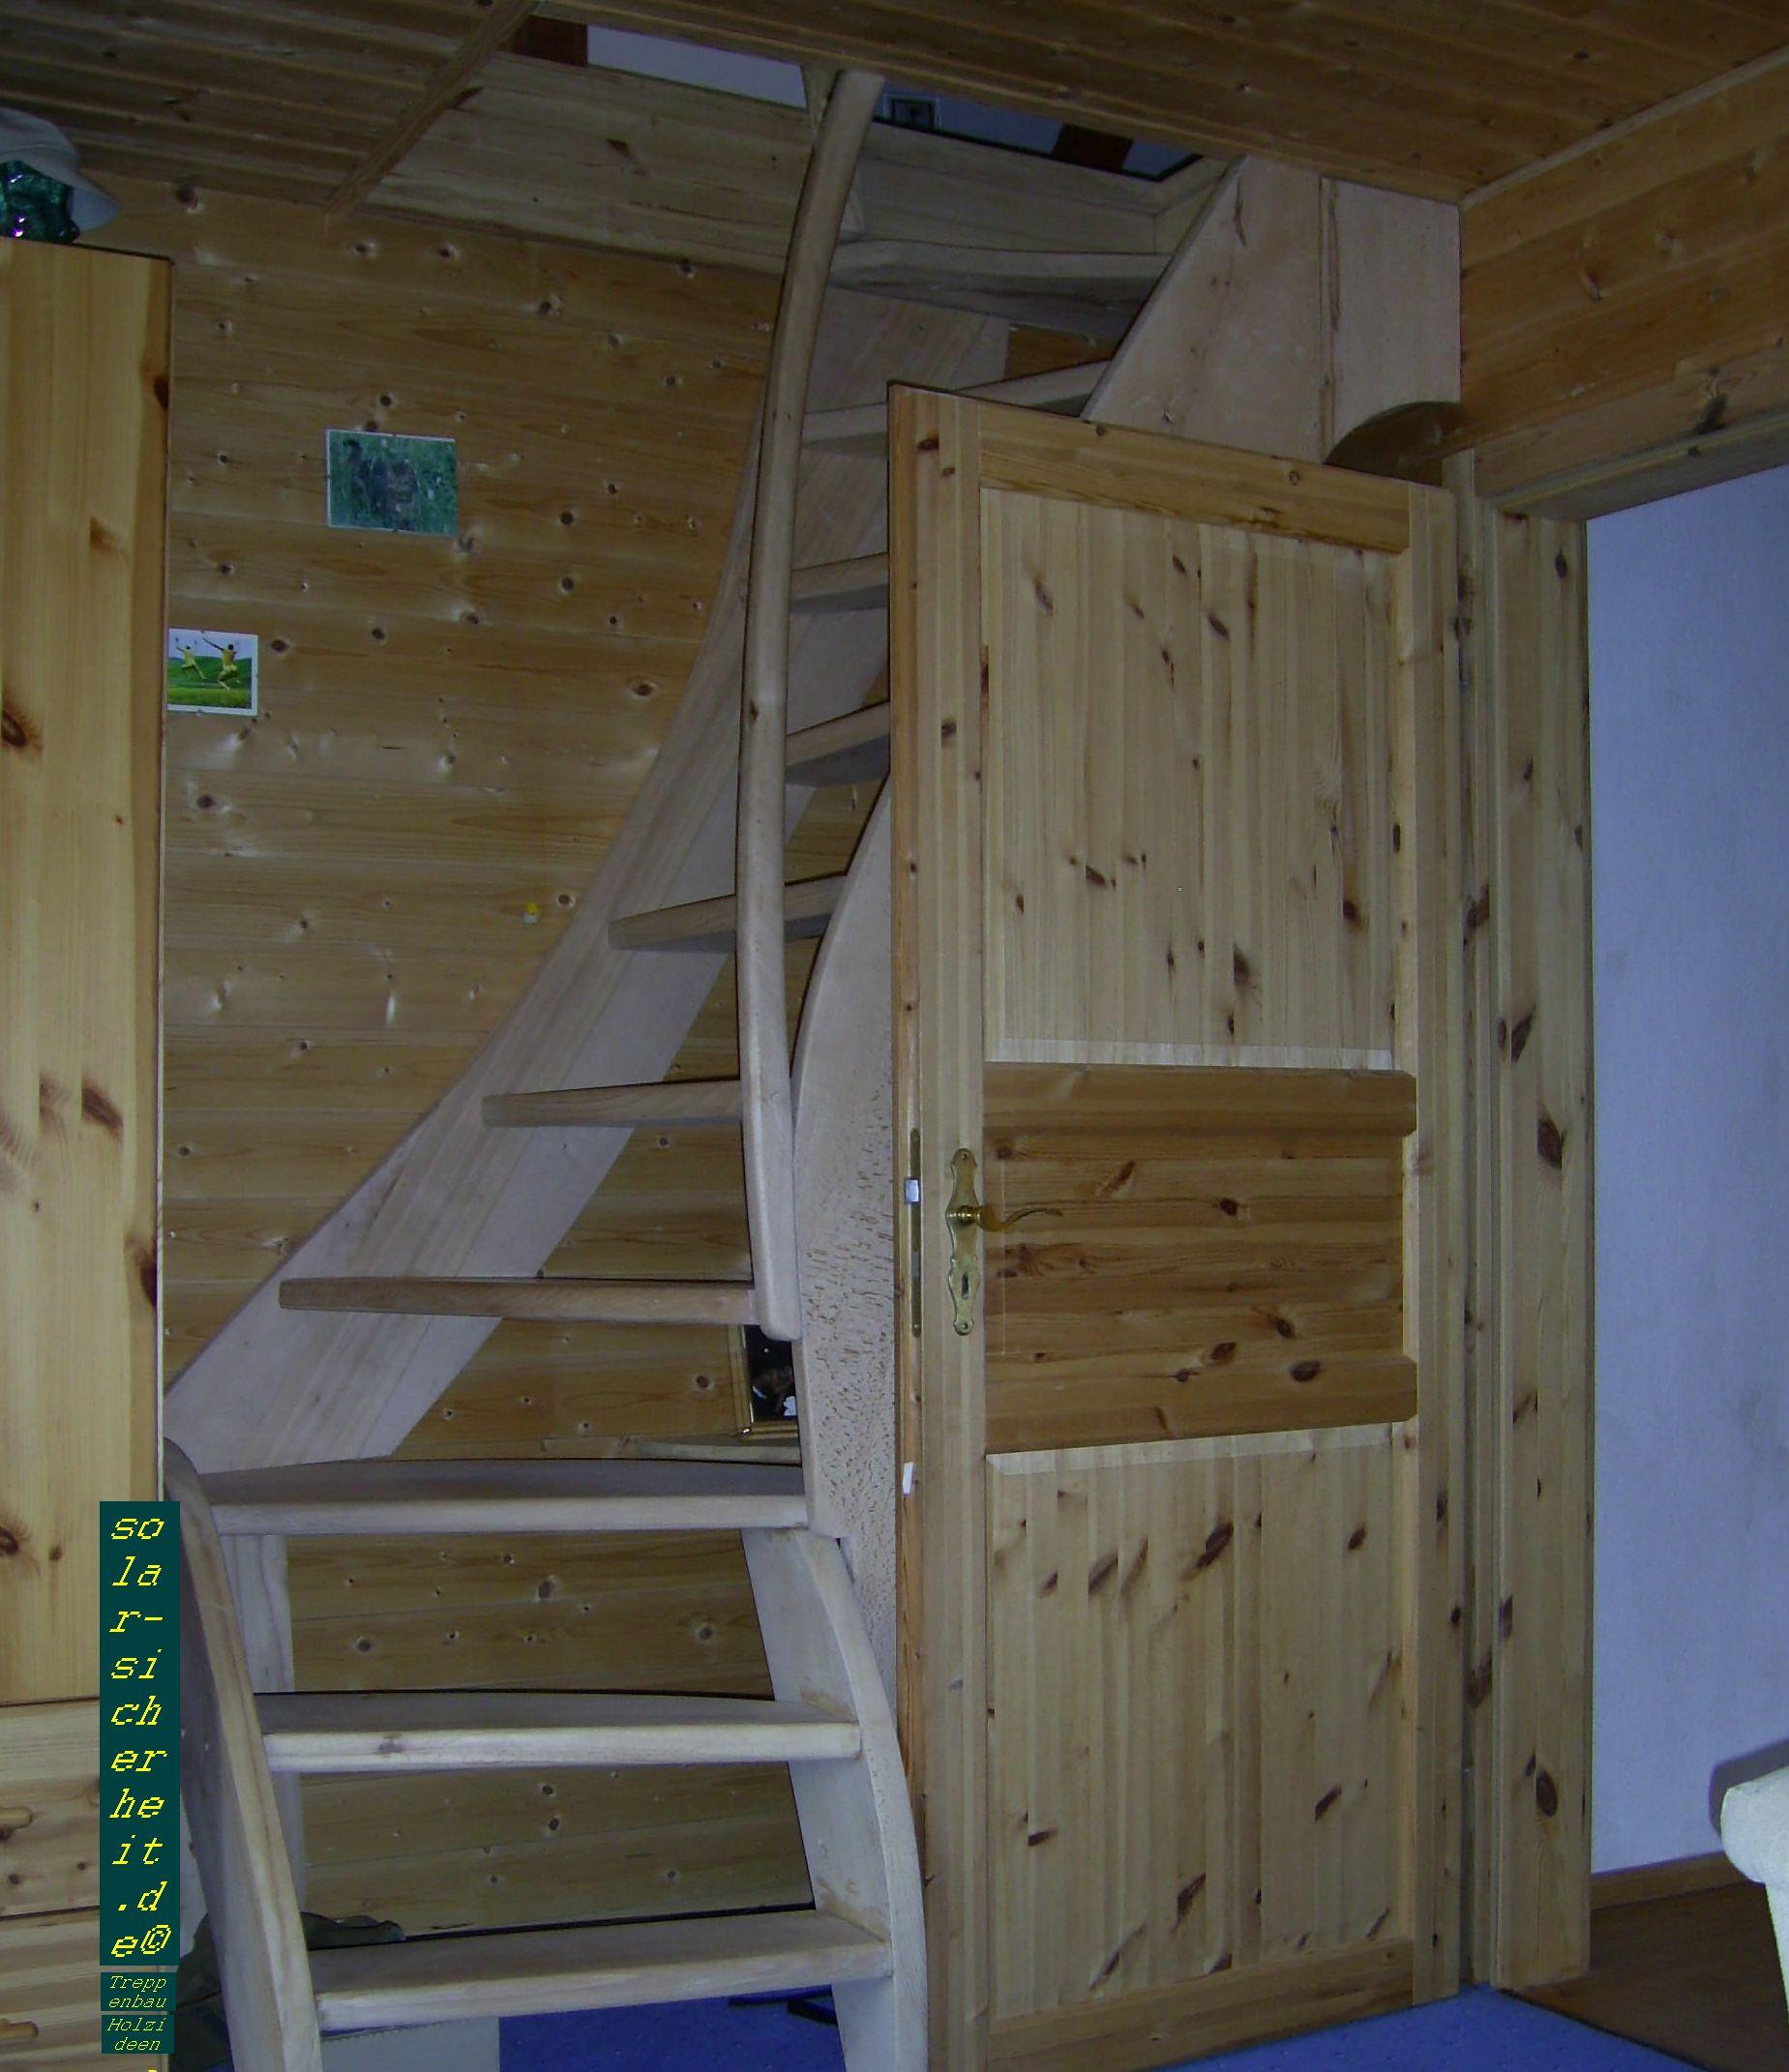 Treppe Platzsparend bodentreppe platzsparende treppe